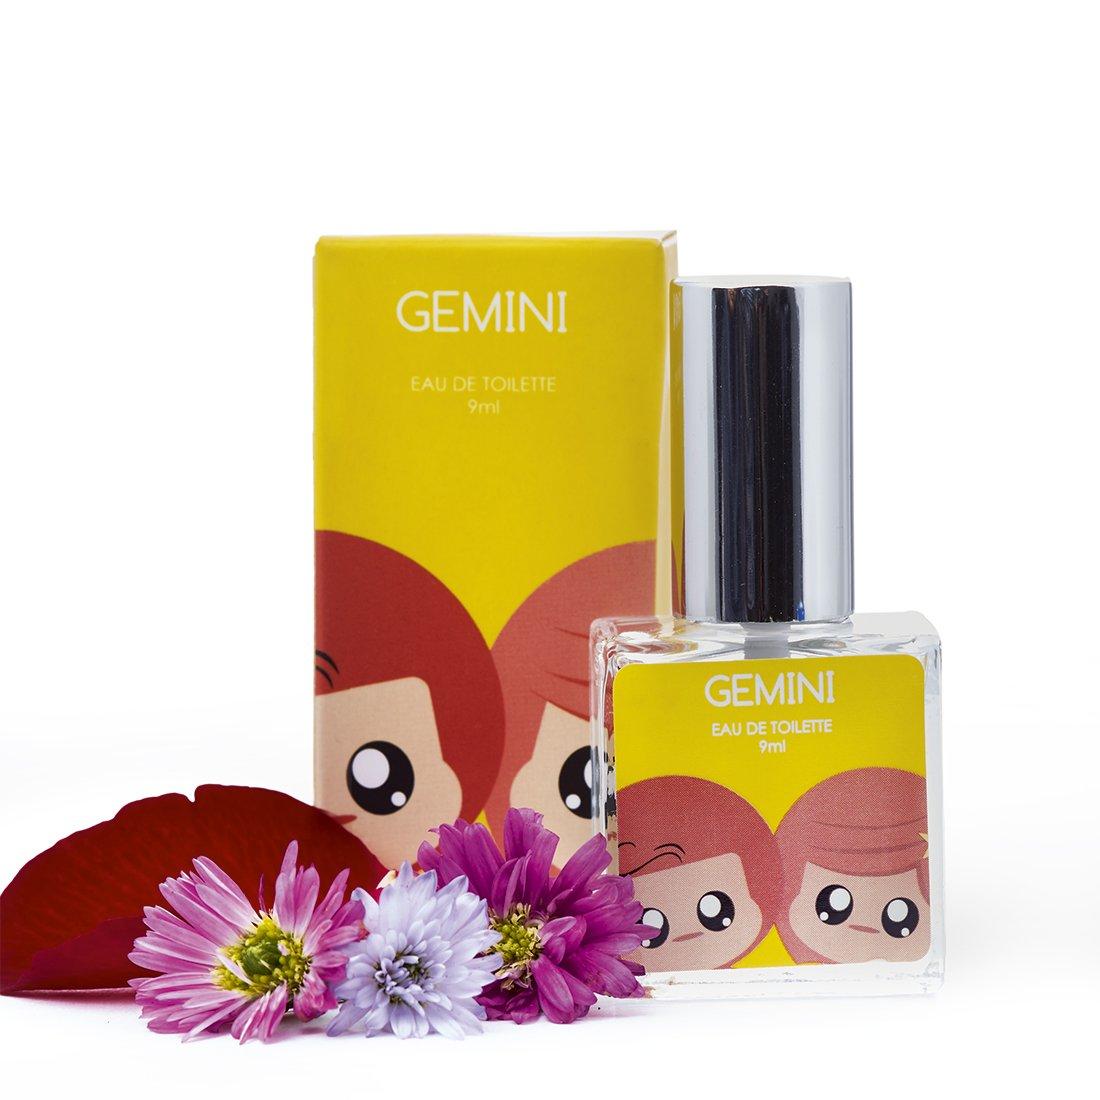 Ini-Dia-Rekomendasi-Parfum-Sesuai-Zodiak-Dari-Brunbrun-gemini